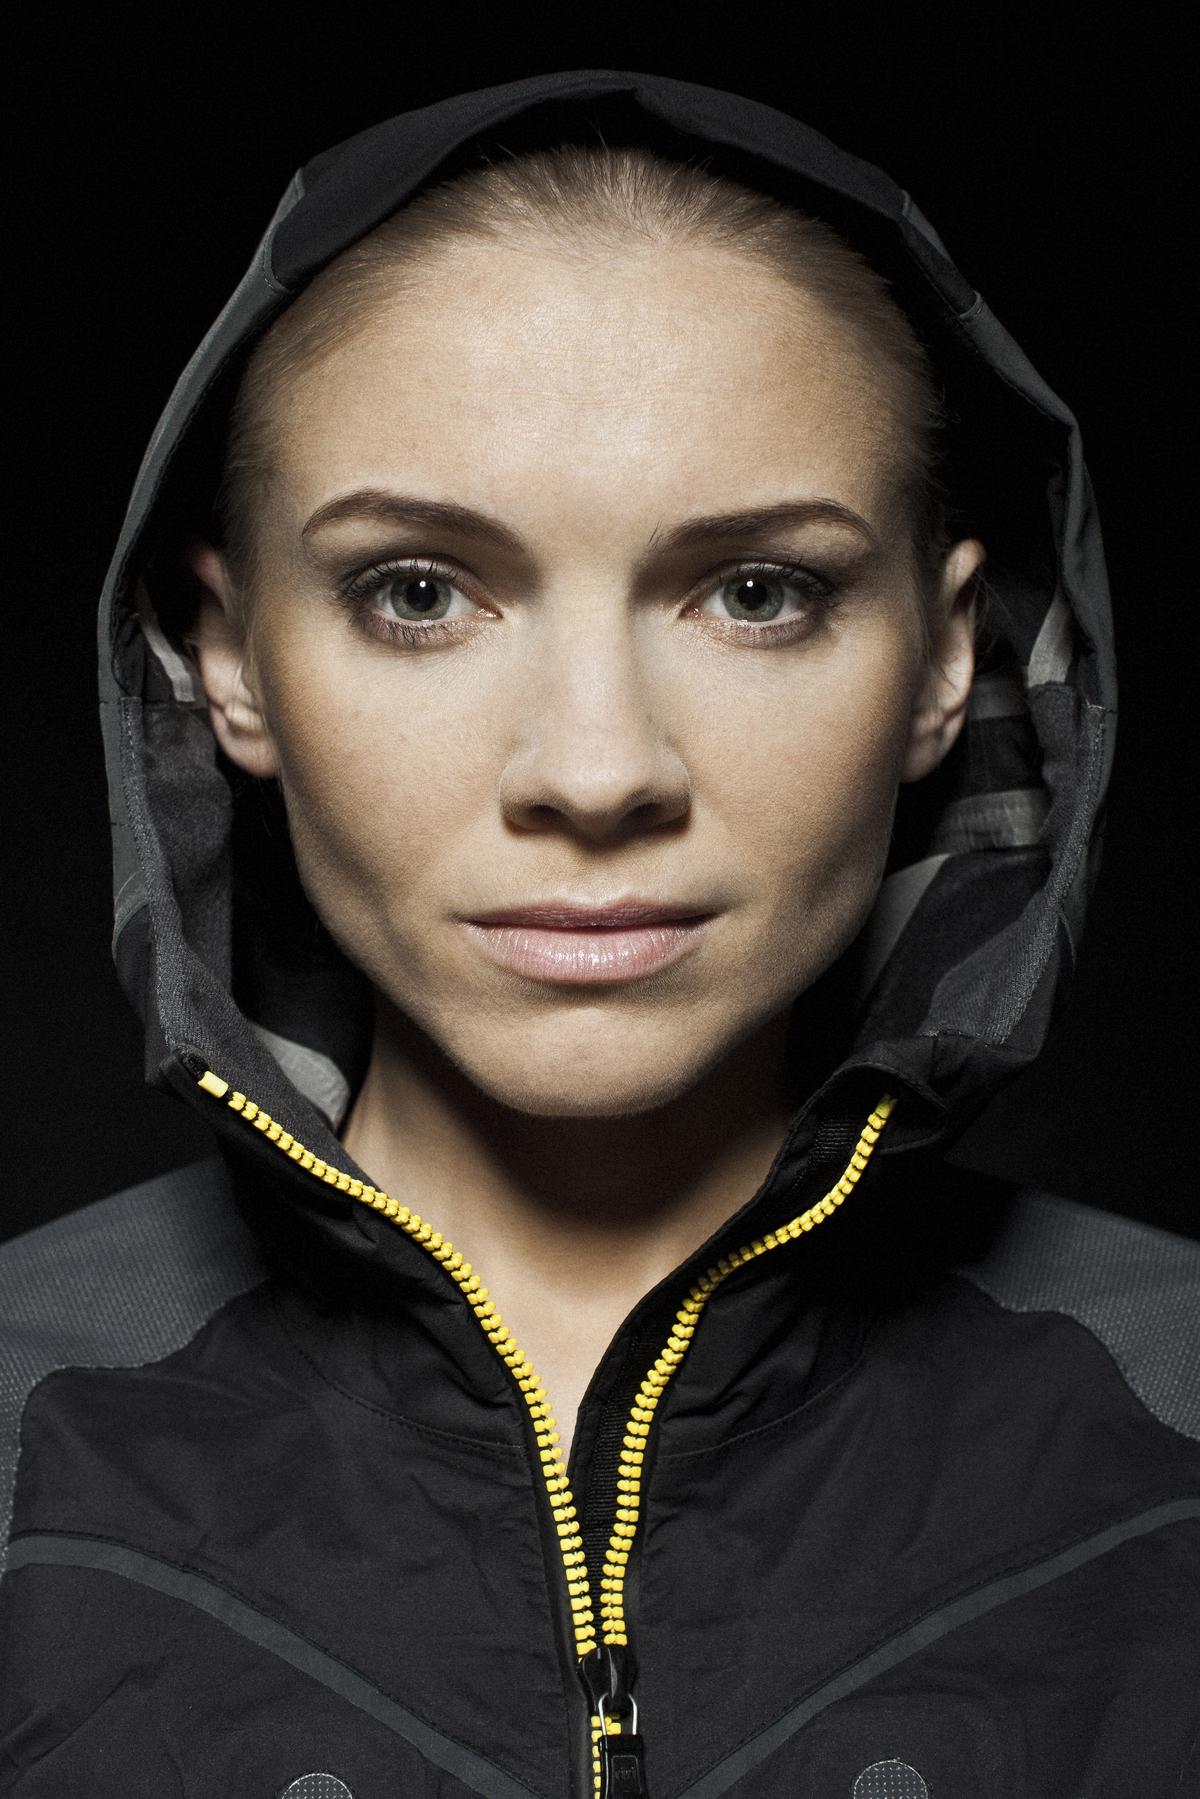 Kinga Baranowska (fot. Marek Kowalski)